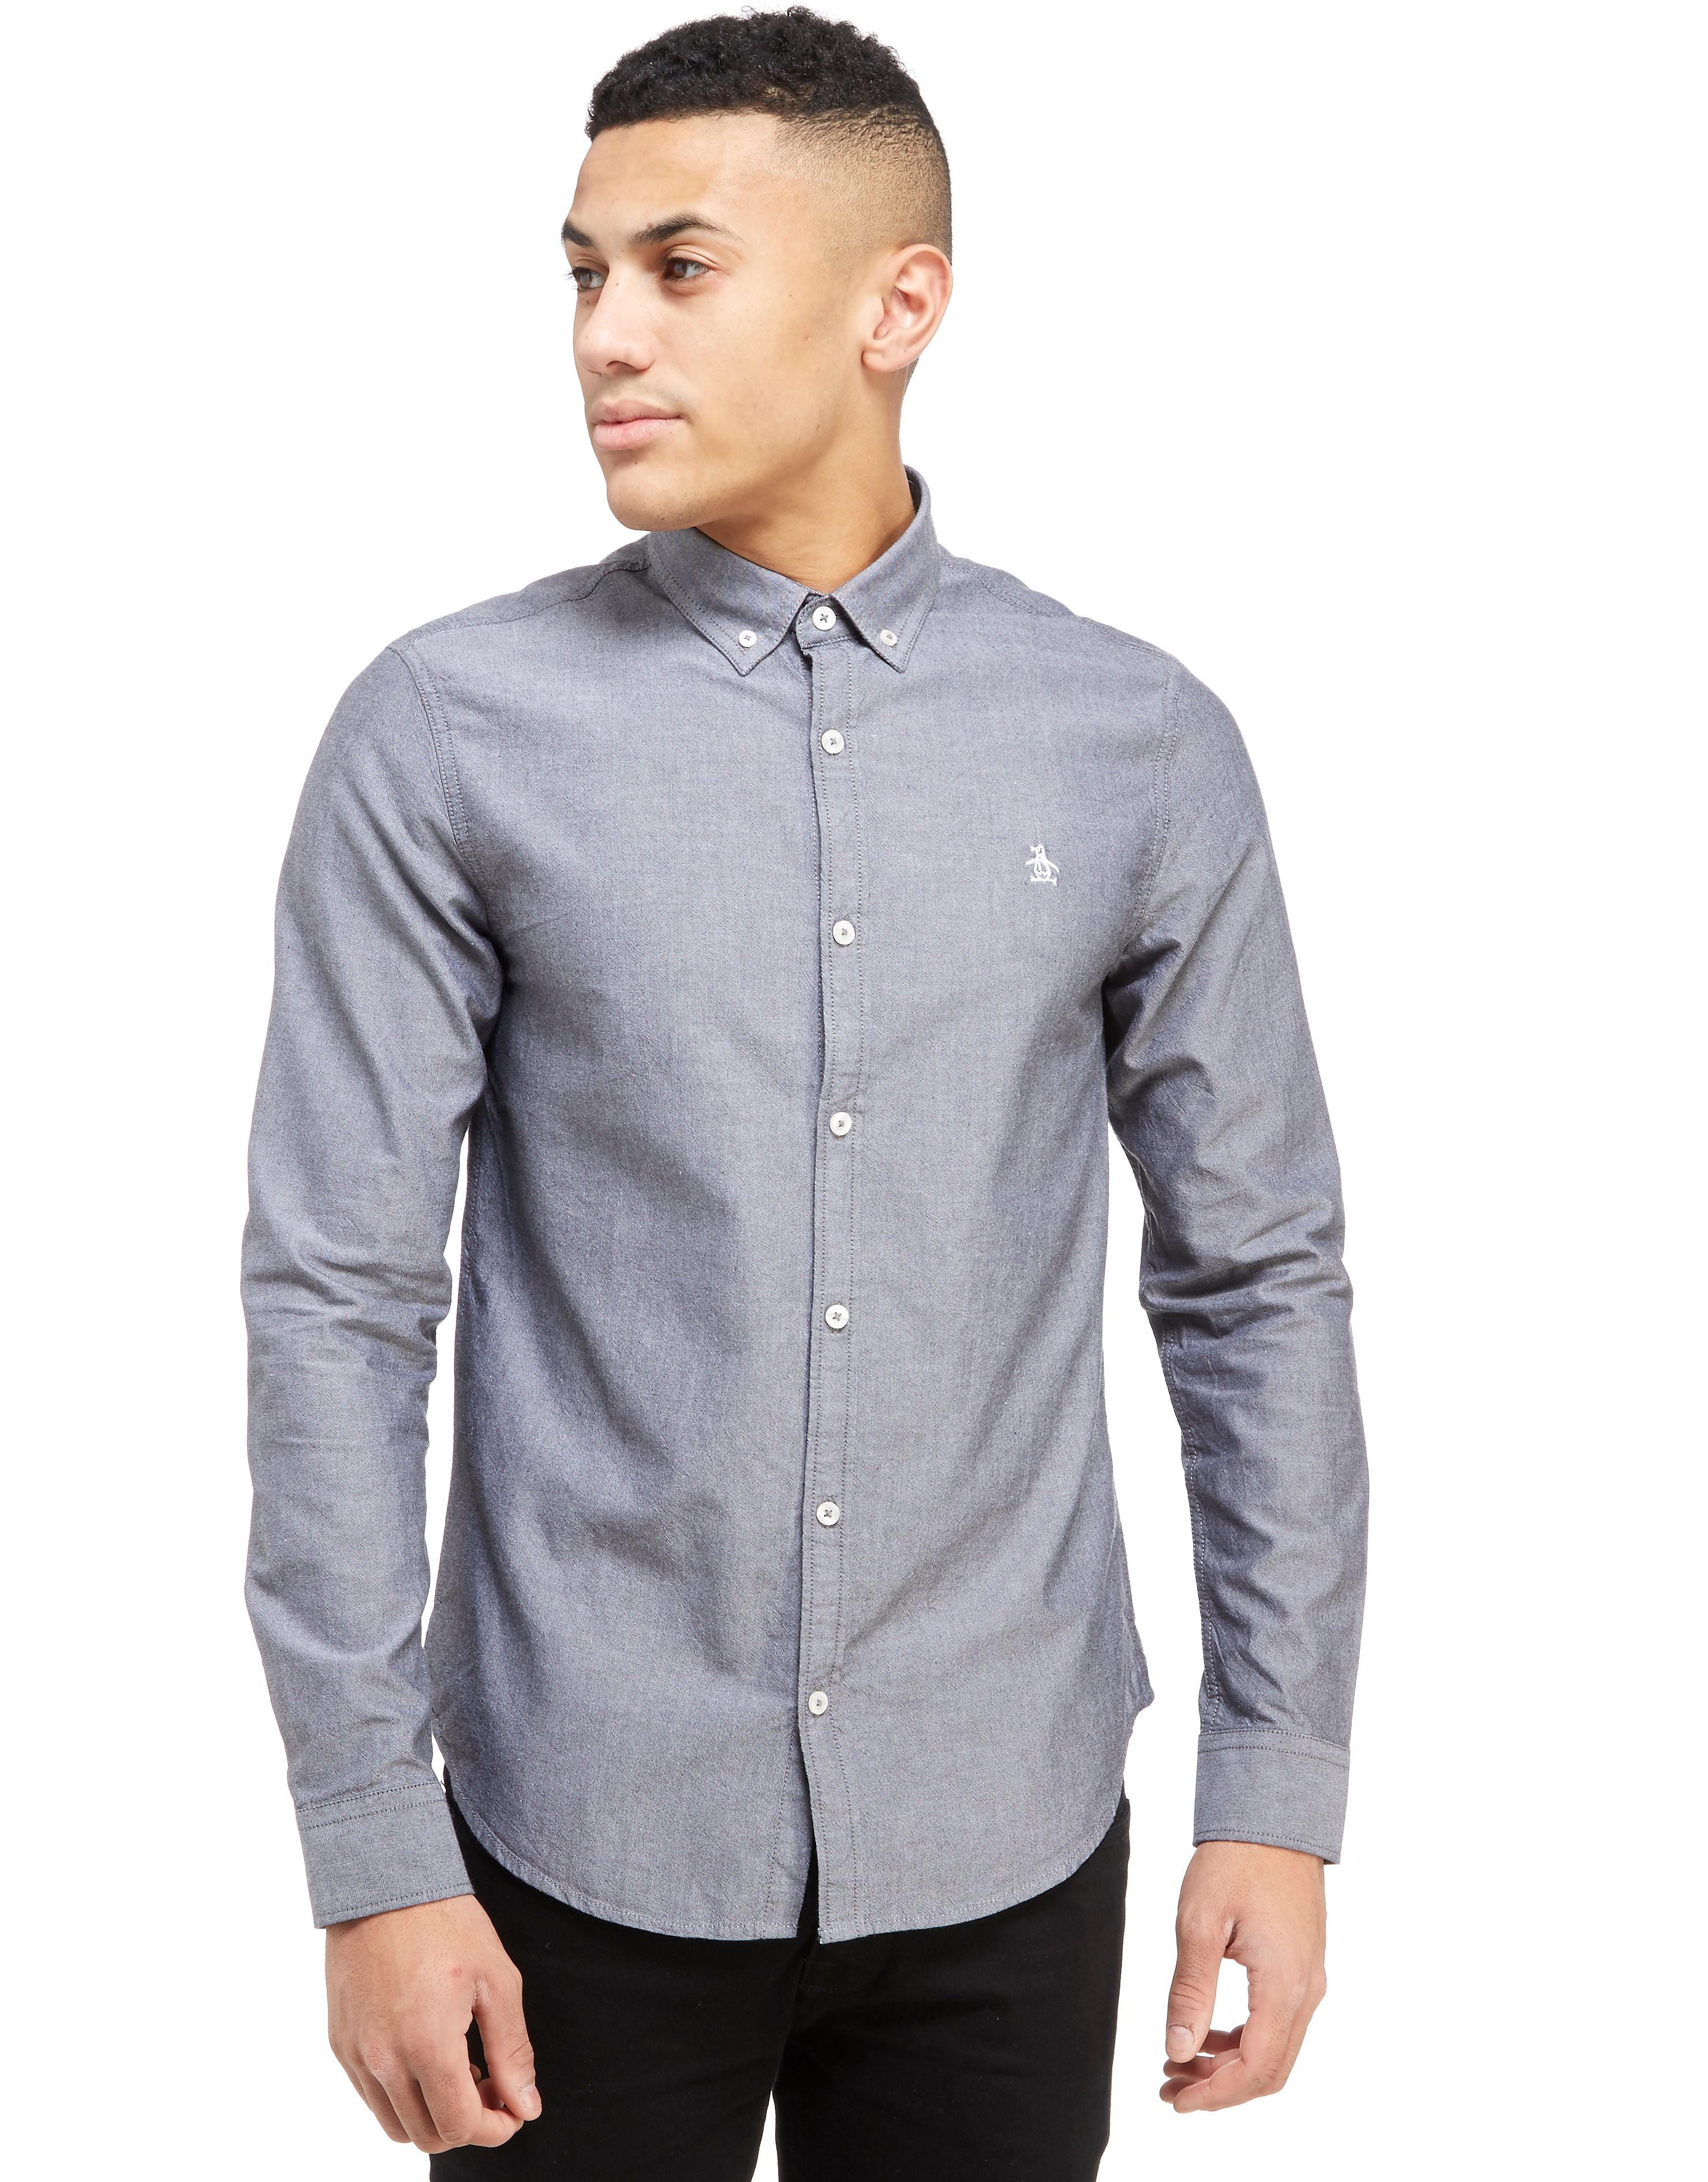 Original Penguin Long Sleeve Oxford Shirt